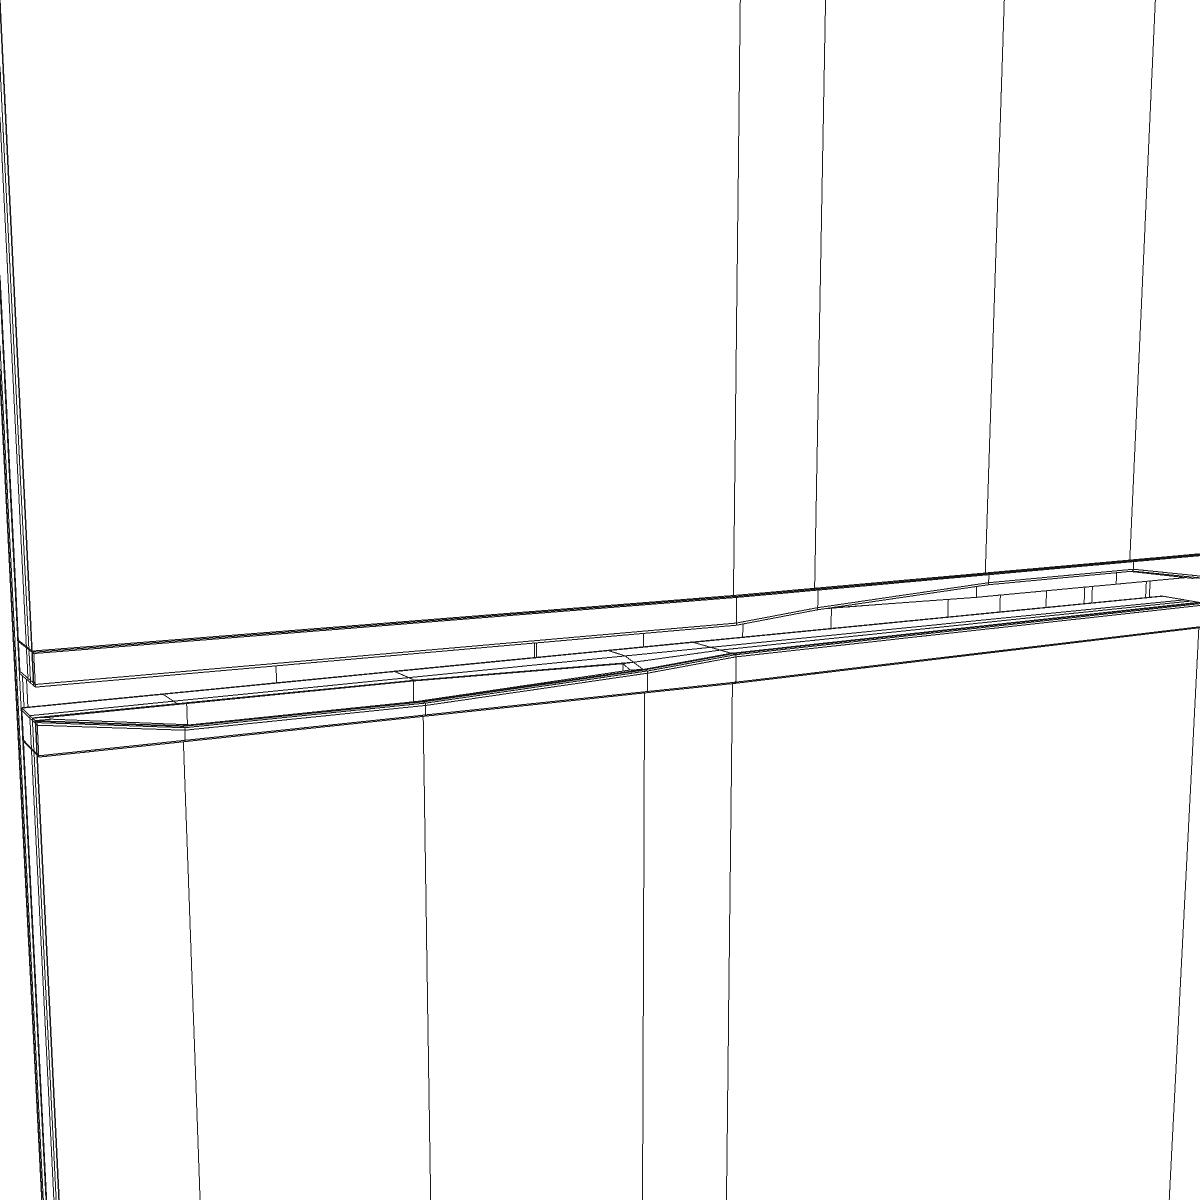 fridge 3d model 3ds max fbx ma mb obj 158913